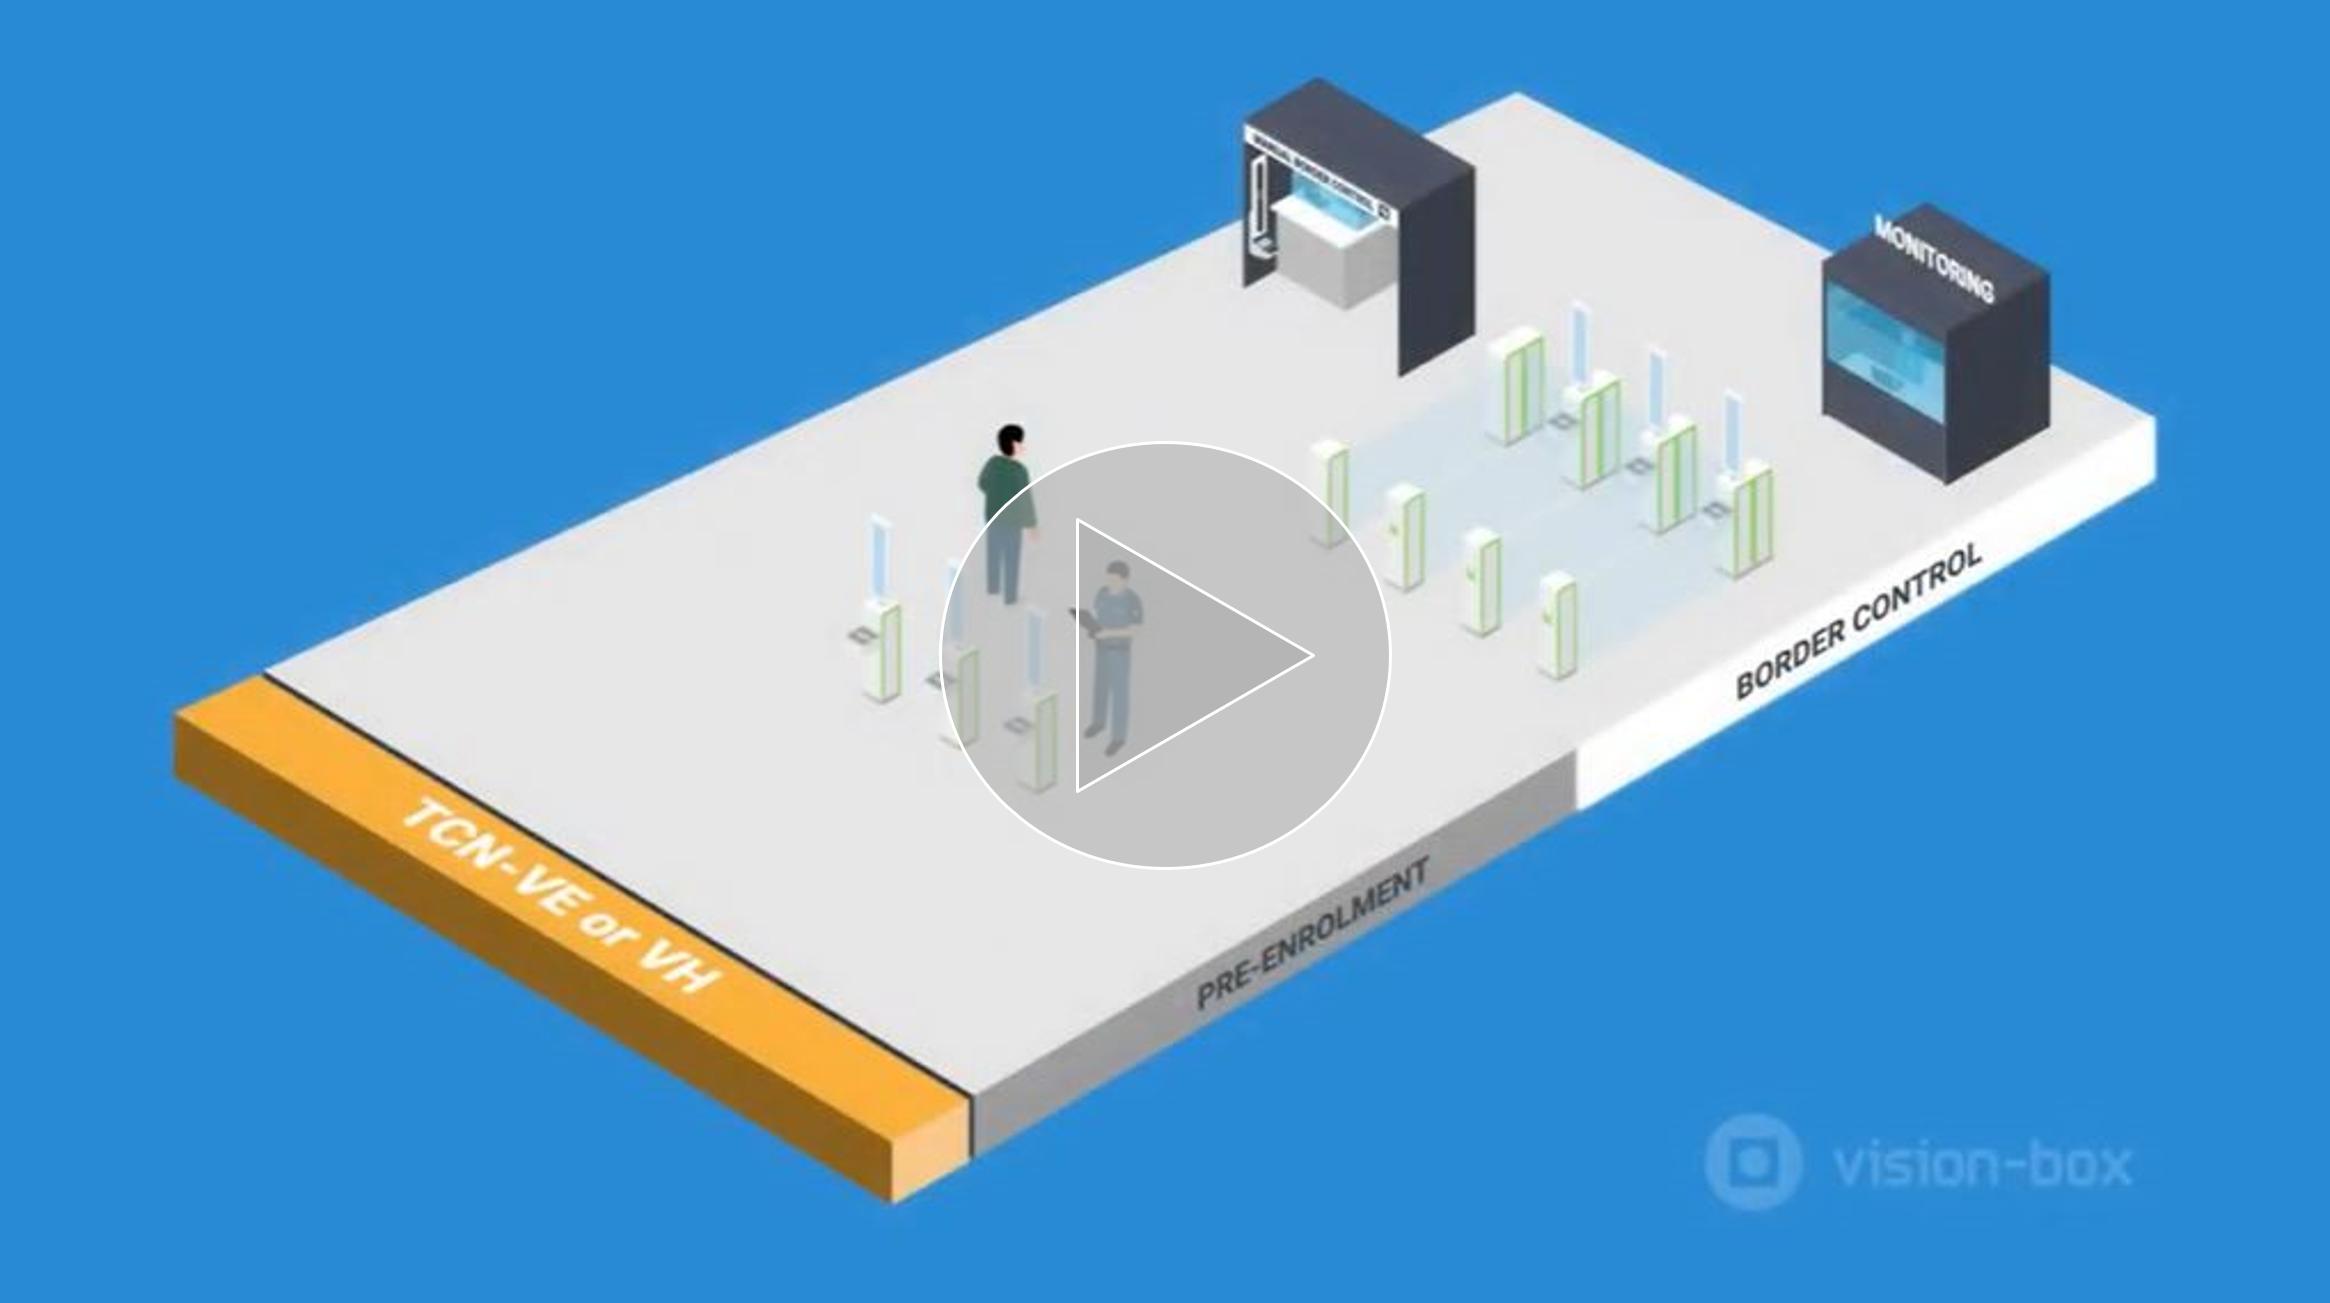 Vision-Box Smart Borders Solutions - ABC eGate_video